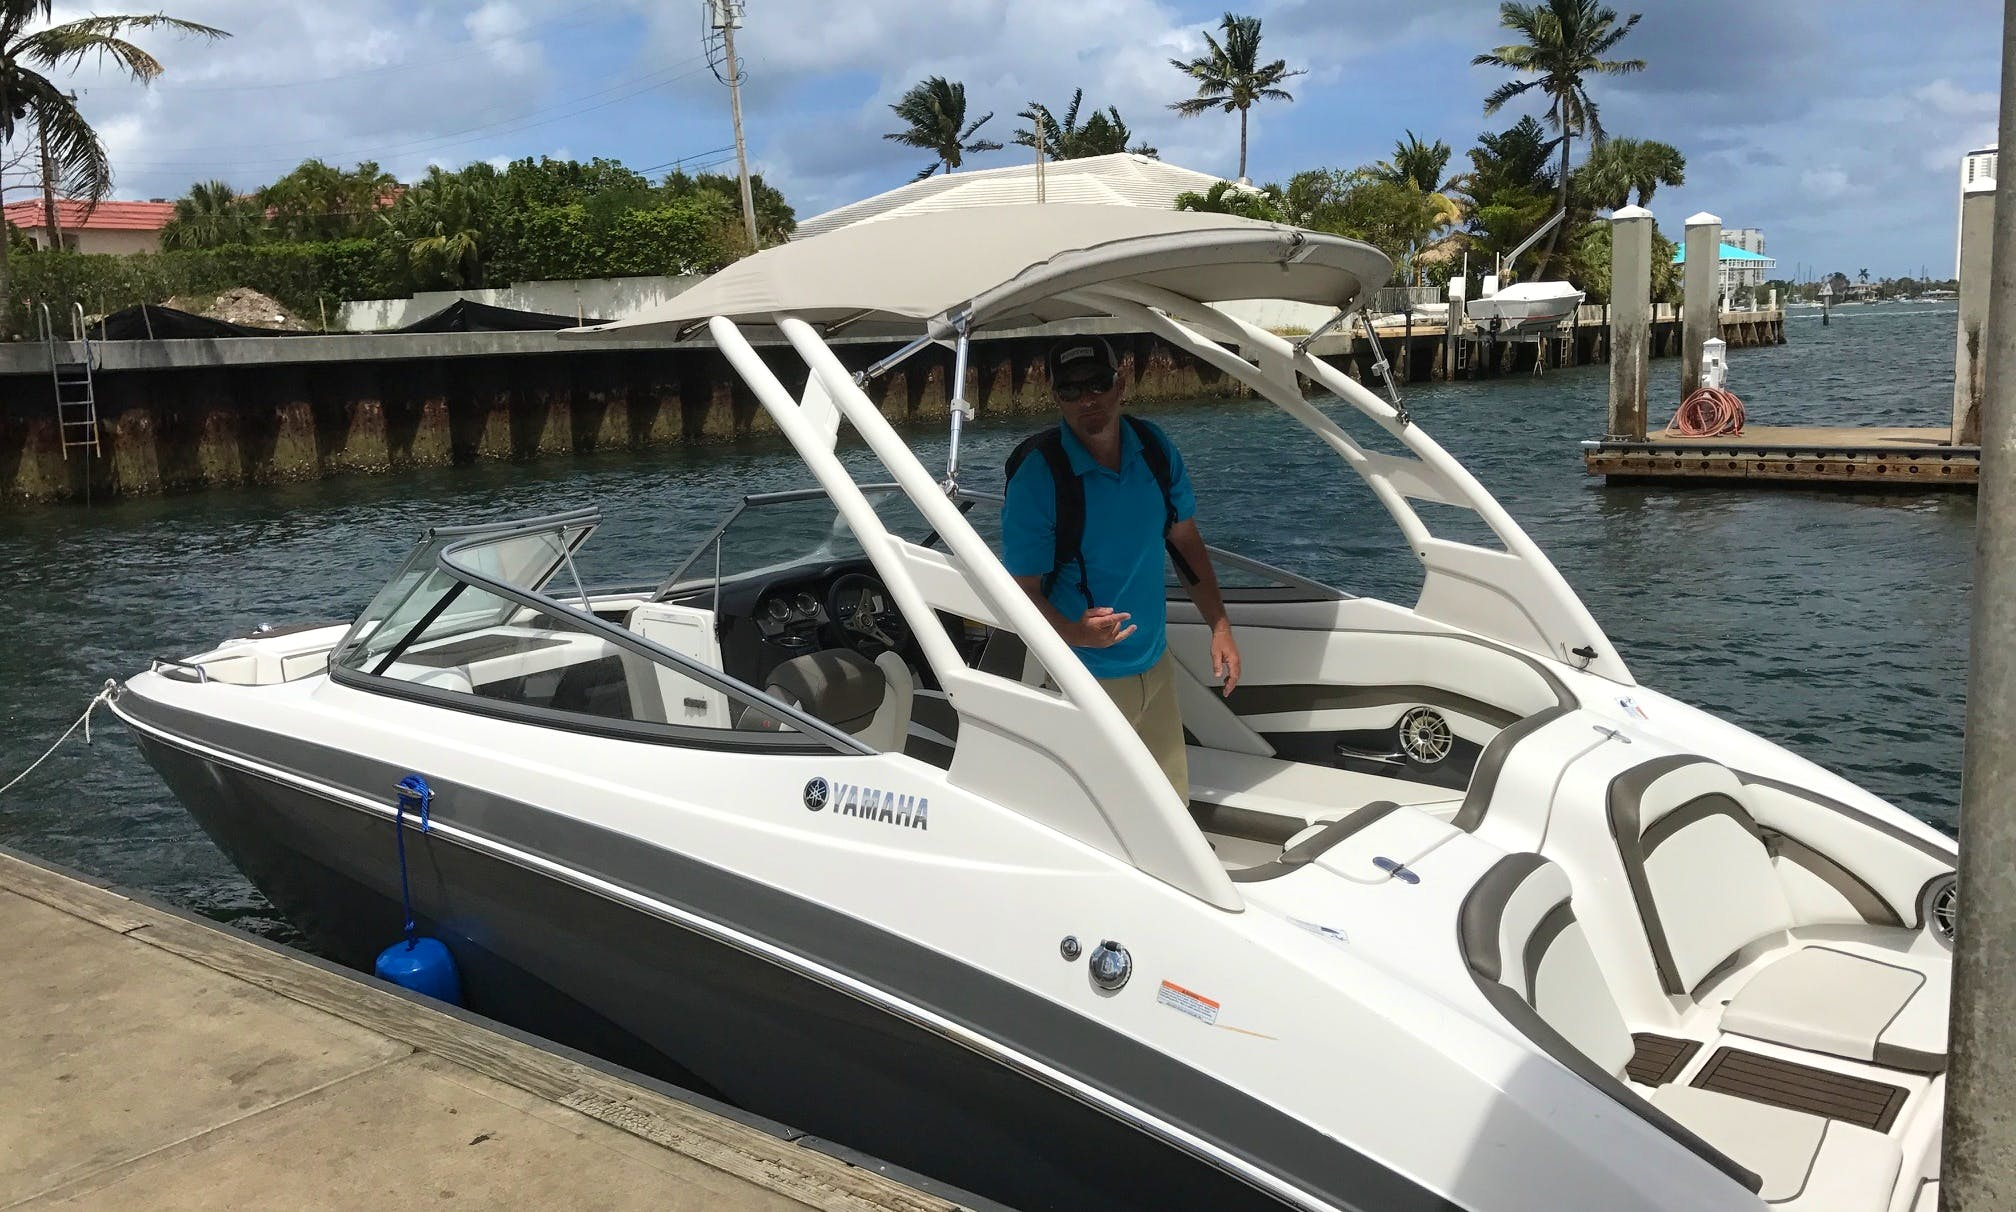 Exclusive Wakeboarding Adventure - 2016 Yamaha Bowrider in Riviera Beach, Florida